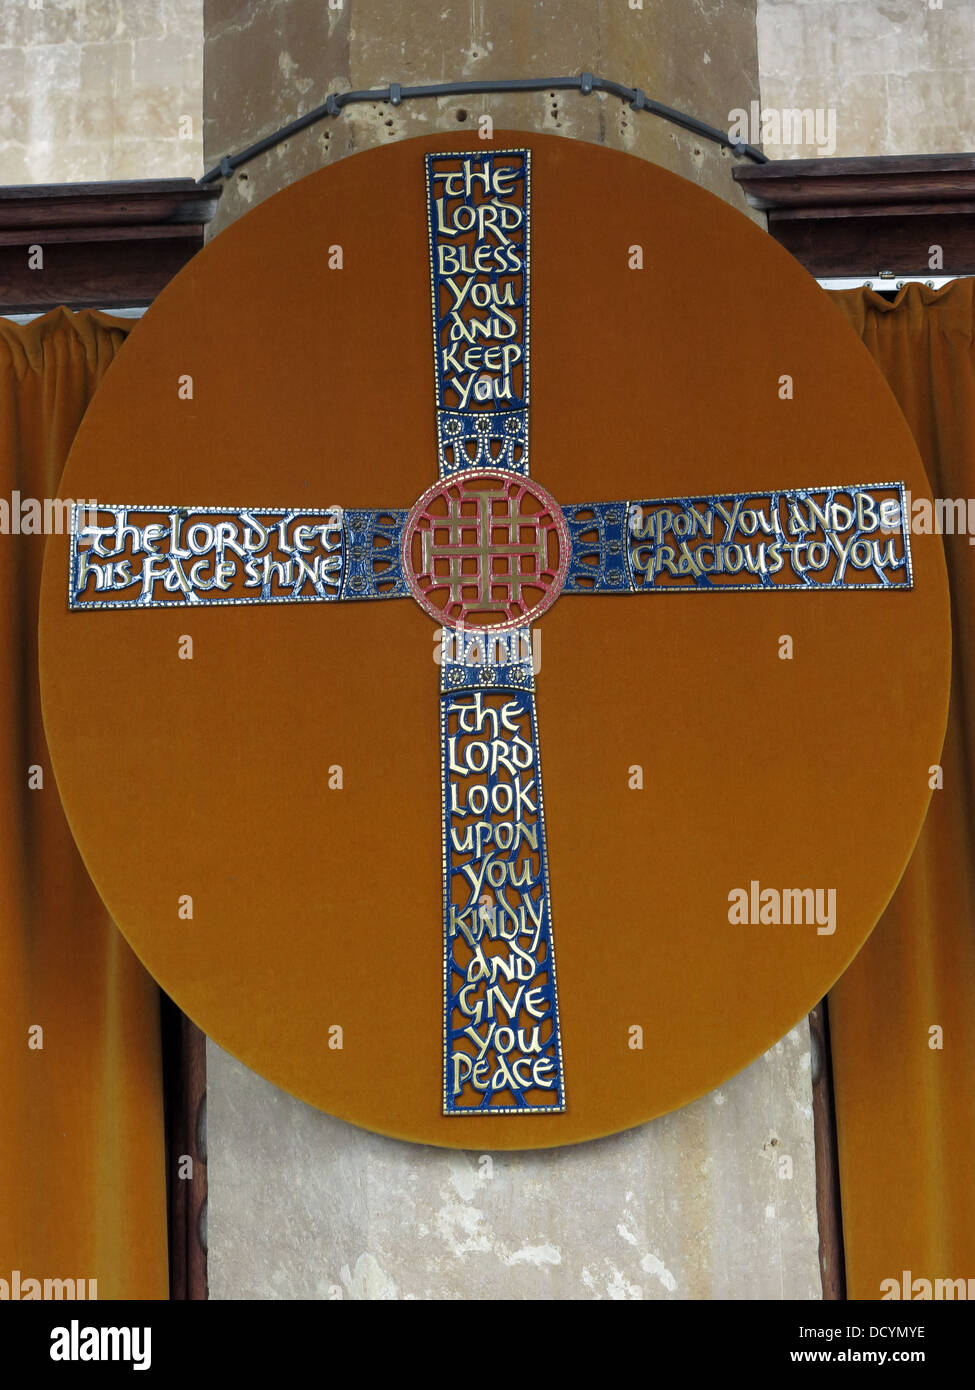 Dieses Stockfoto: Kreuz, Lacock Abbey, Lacock, Wiltshire, England, SN 15. - DCYMYE